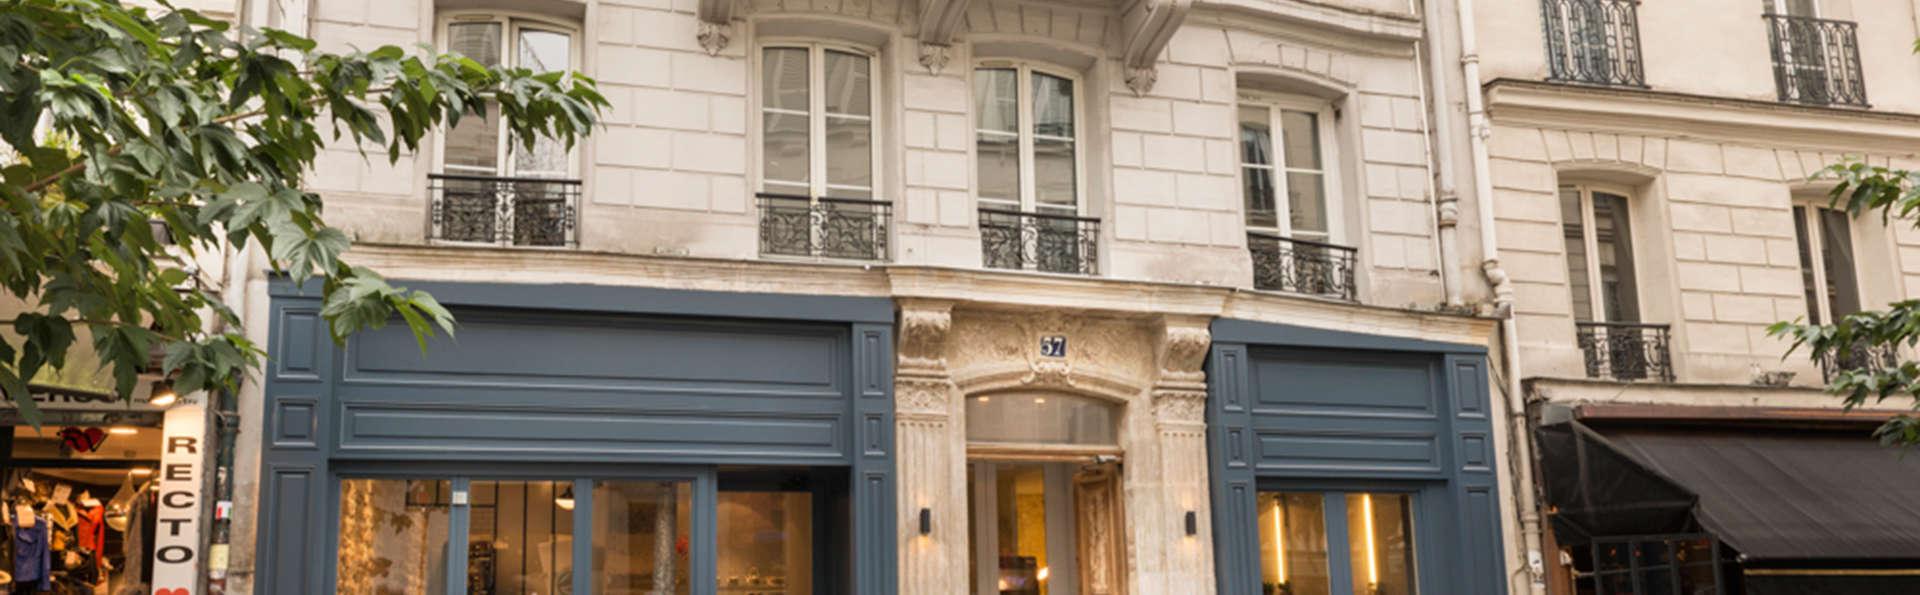 Hotel Basss - Montmartre - EDIT_front1.jpg